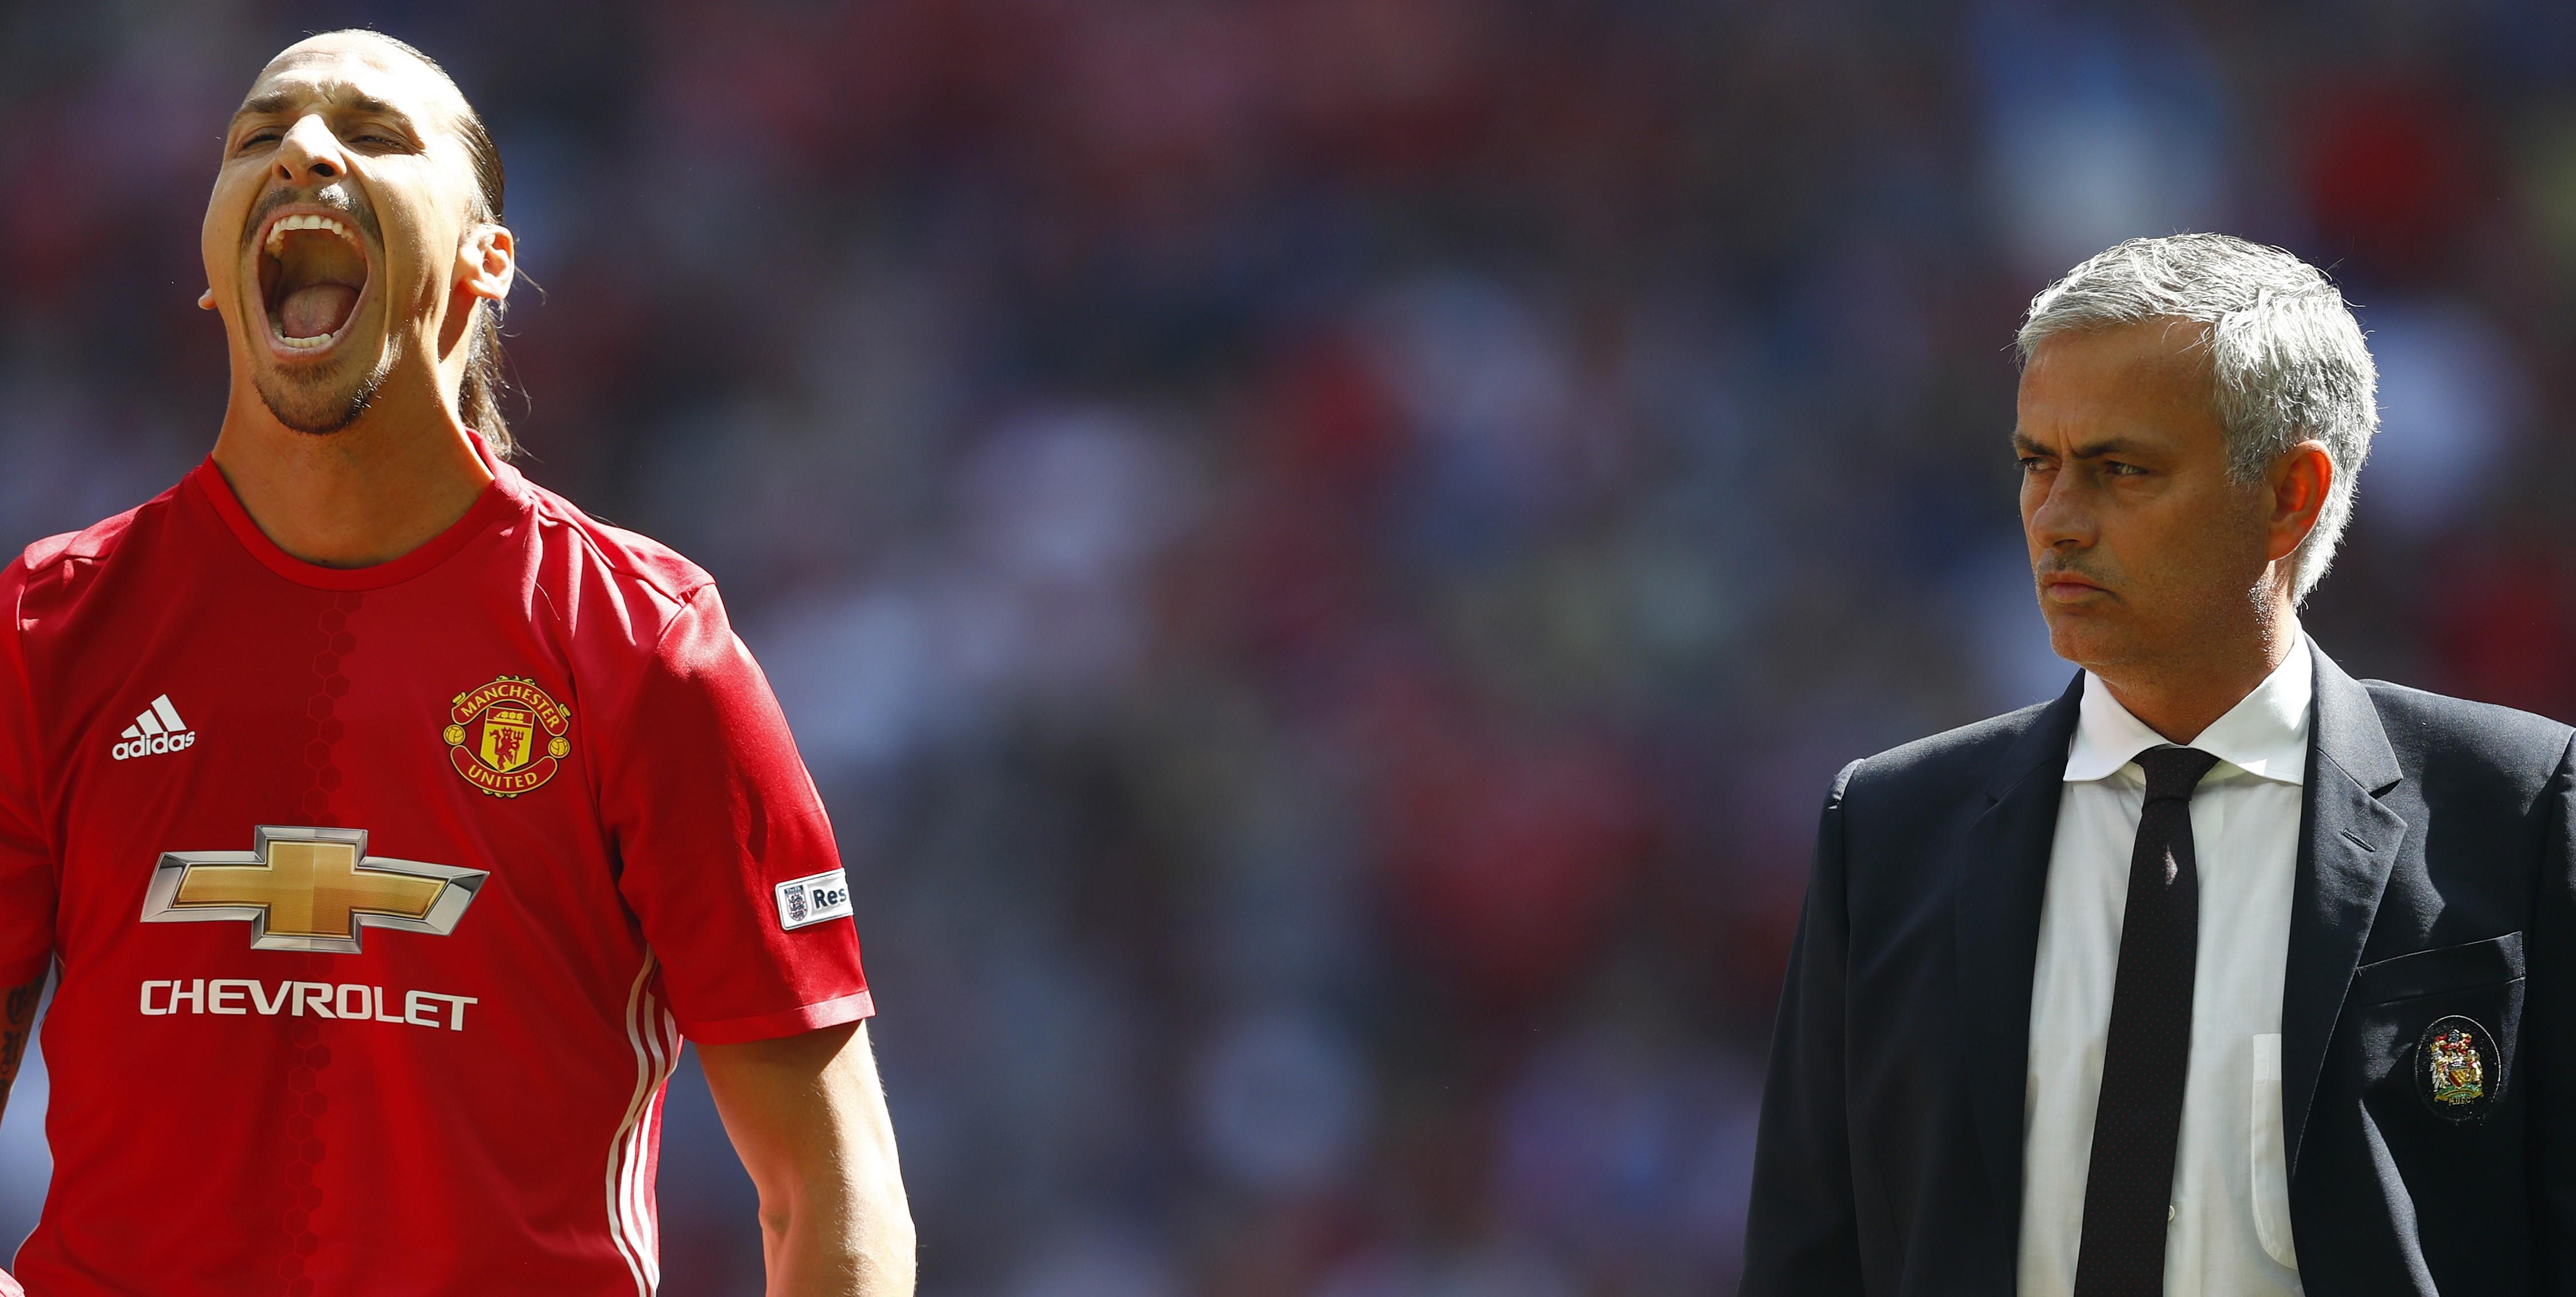 Manchester United - Zlatan Ibrahimovc and Jose Mourinho